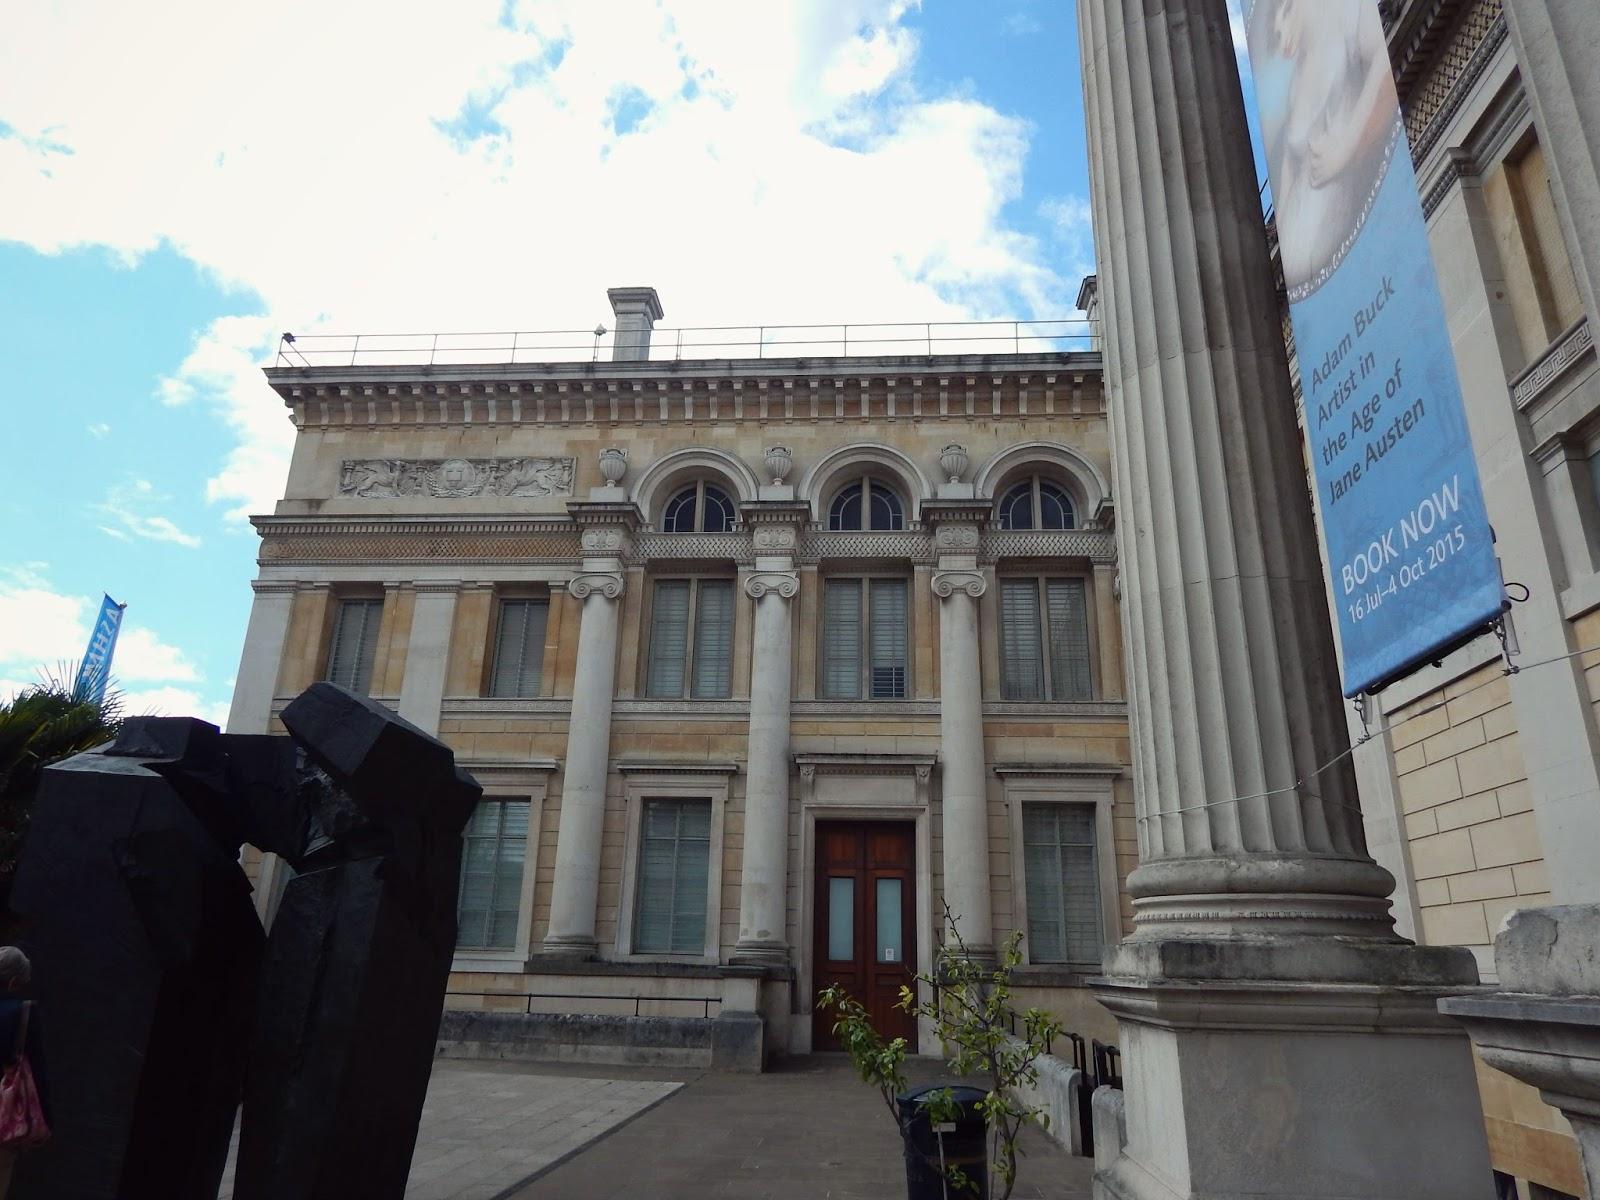 Oxford Ashmolean Museum